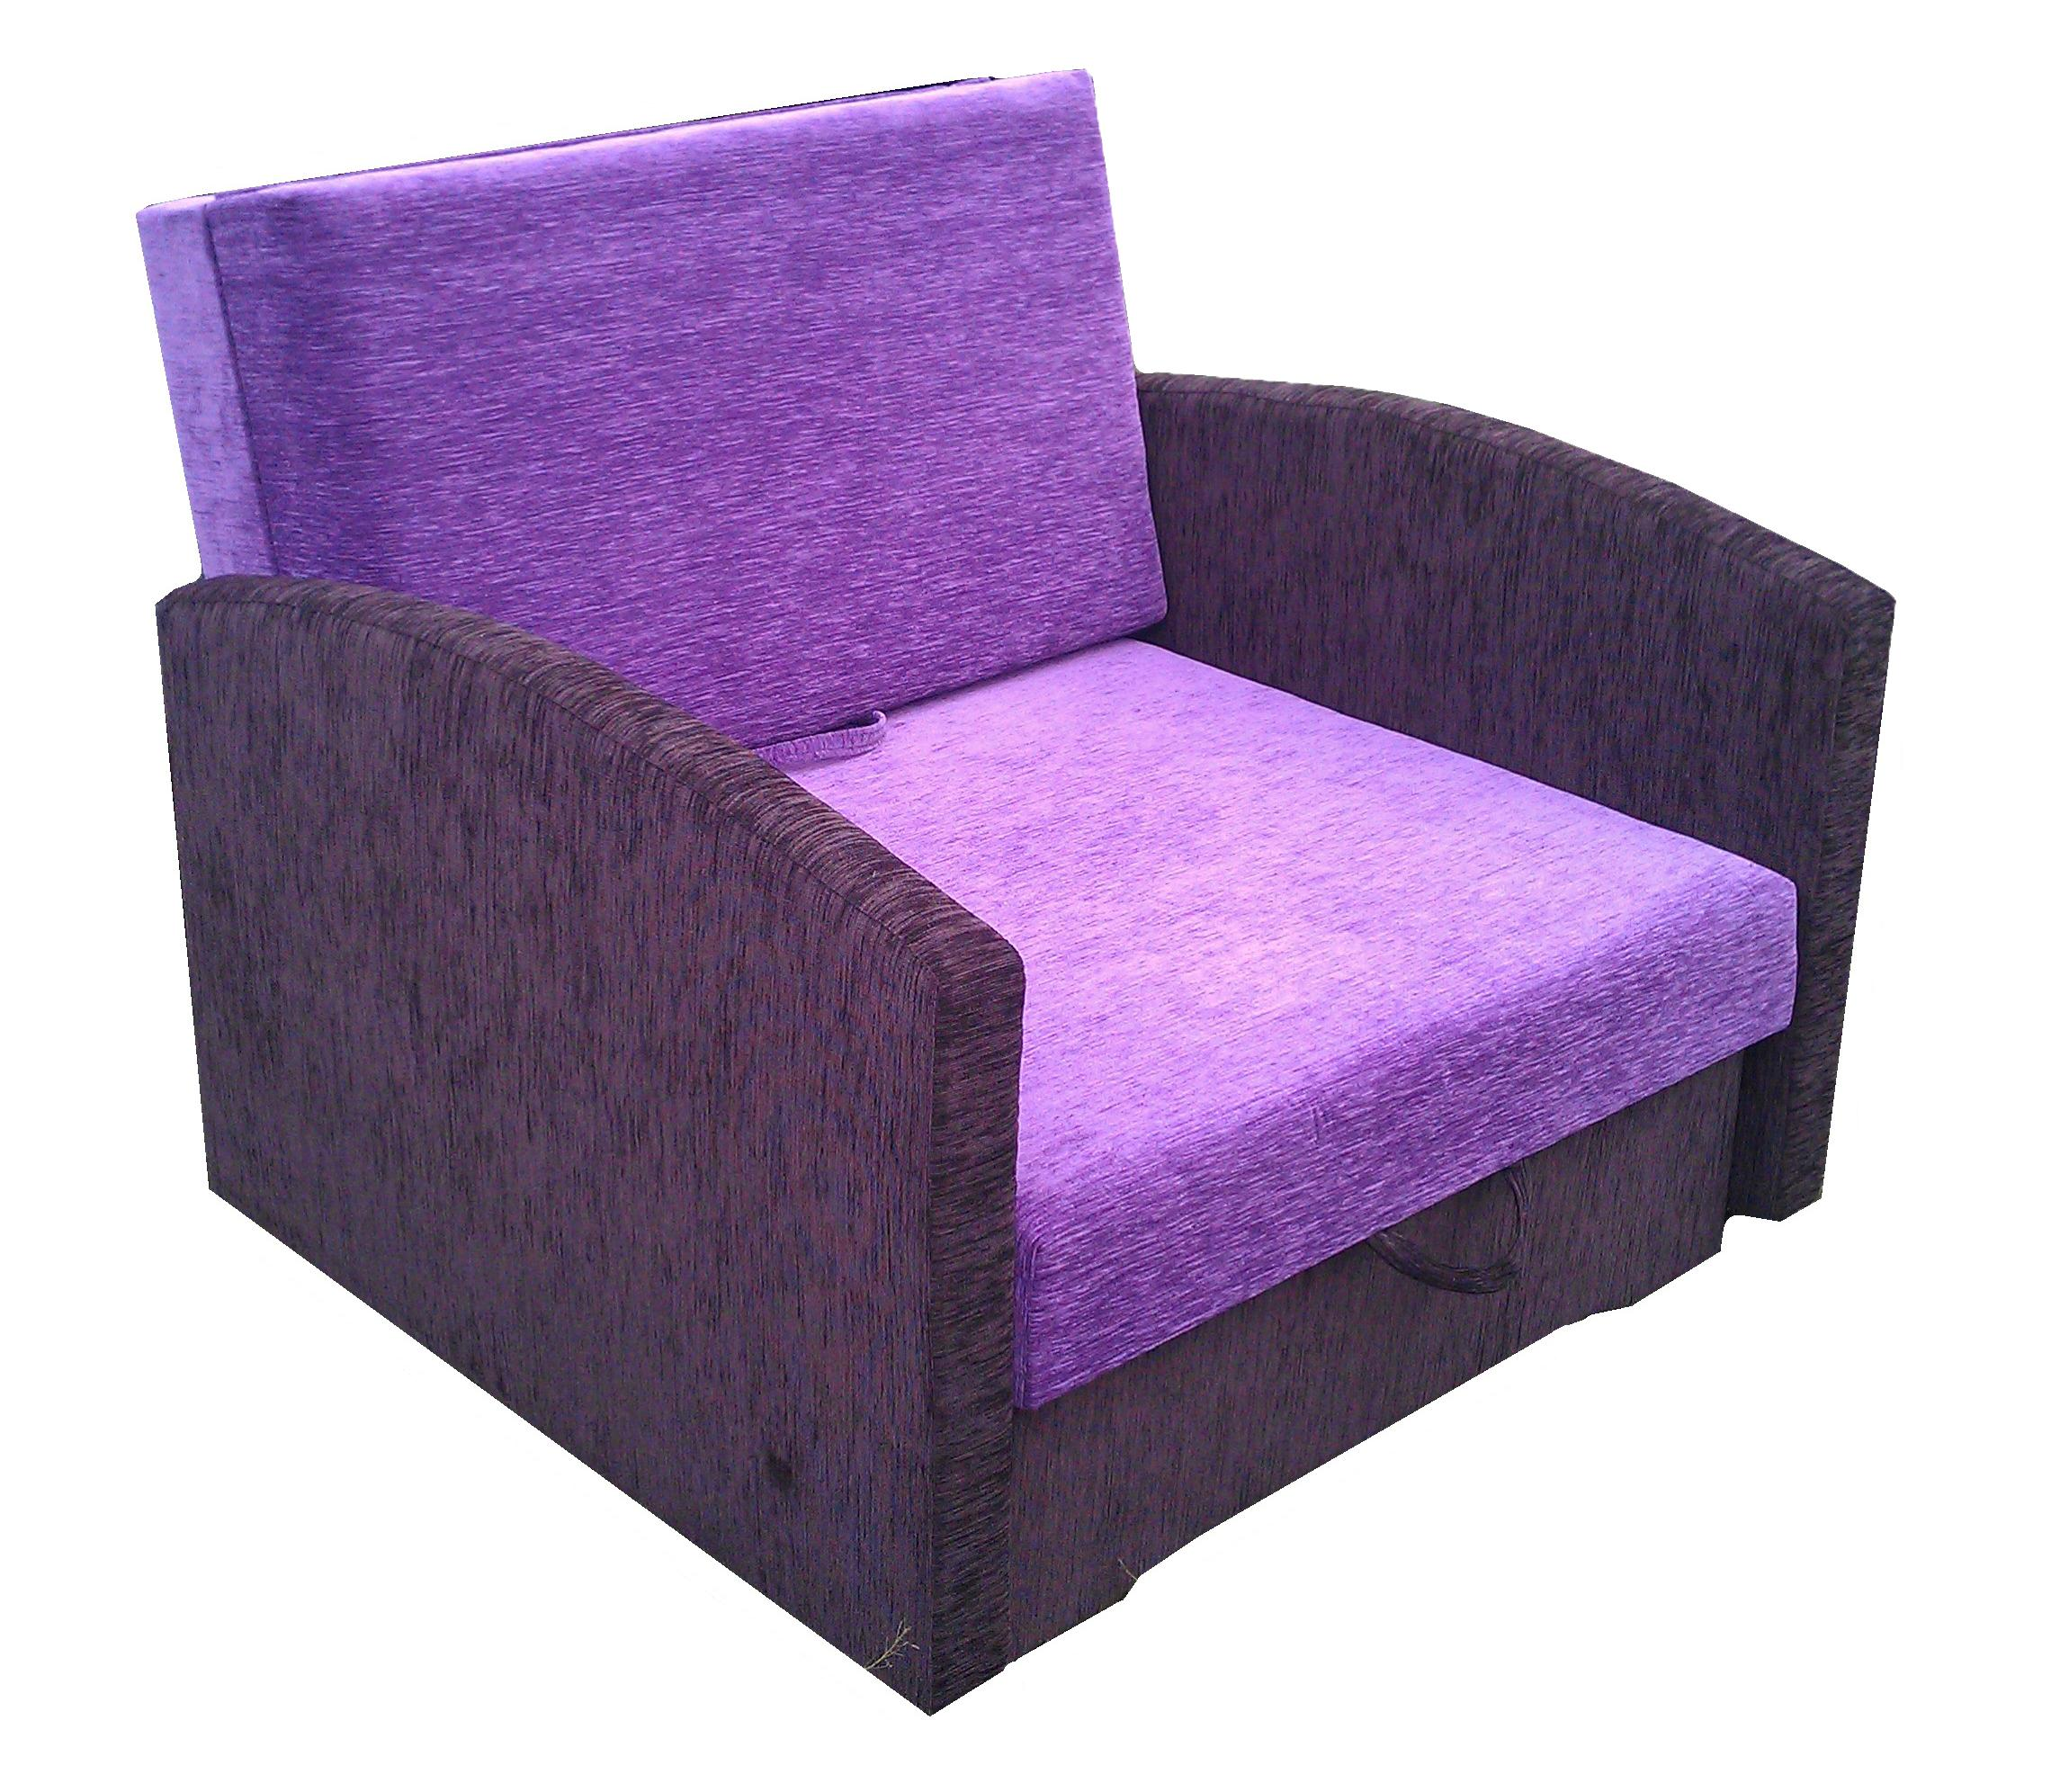 Jednoosobowa amerykanka sofa lupo for Sofa jednoosobowa